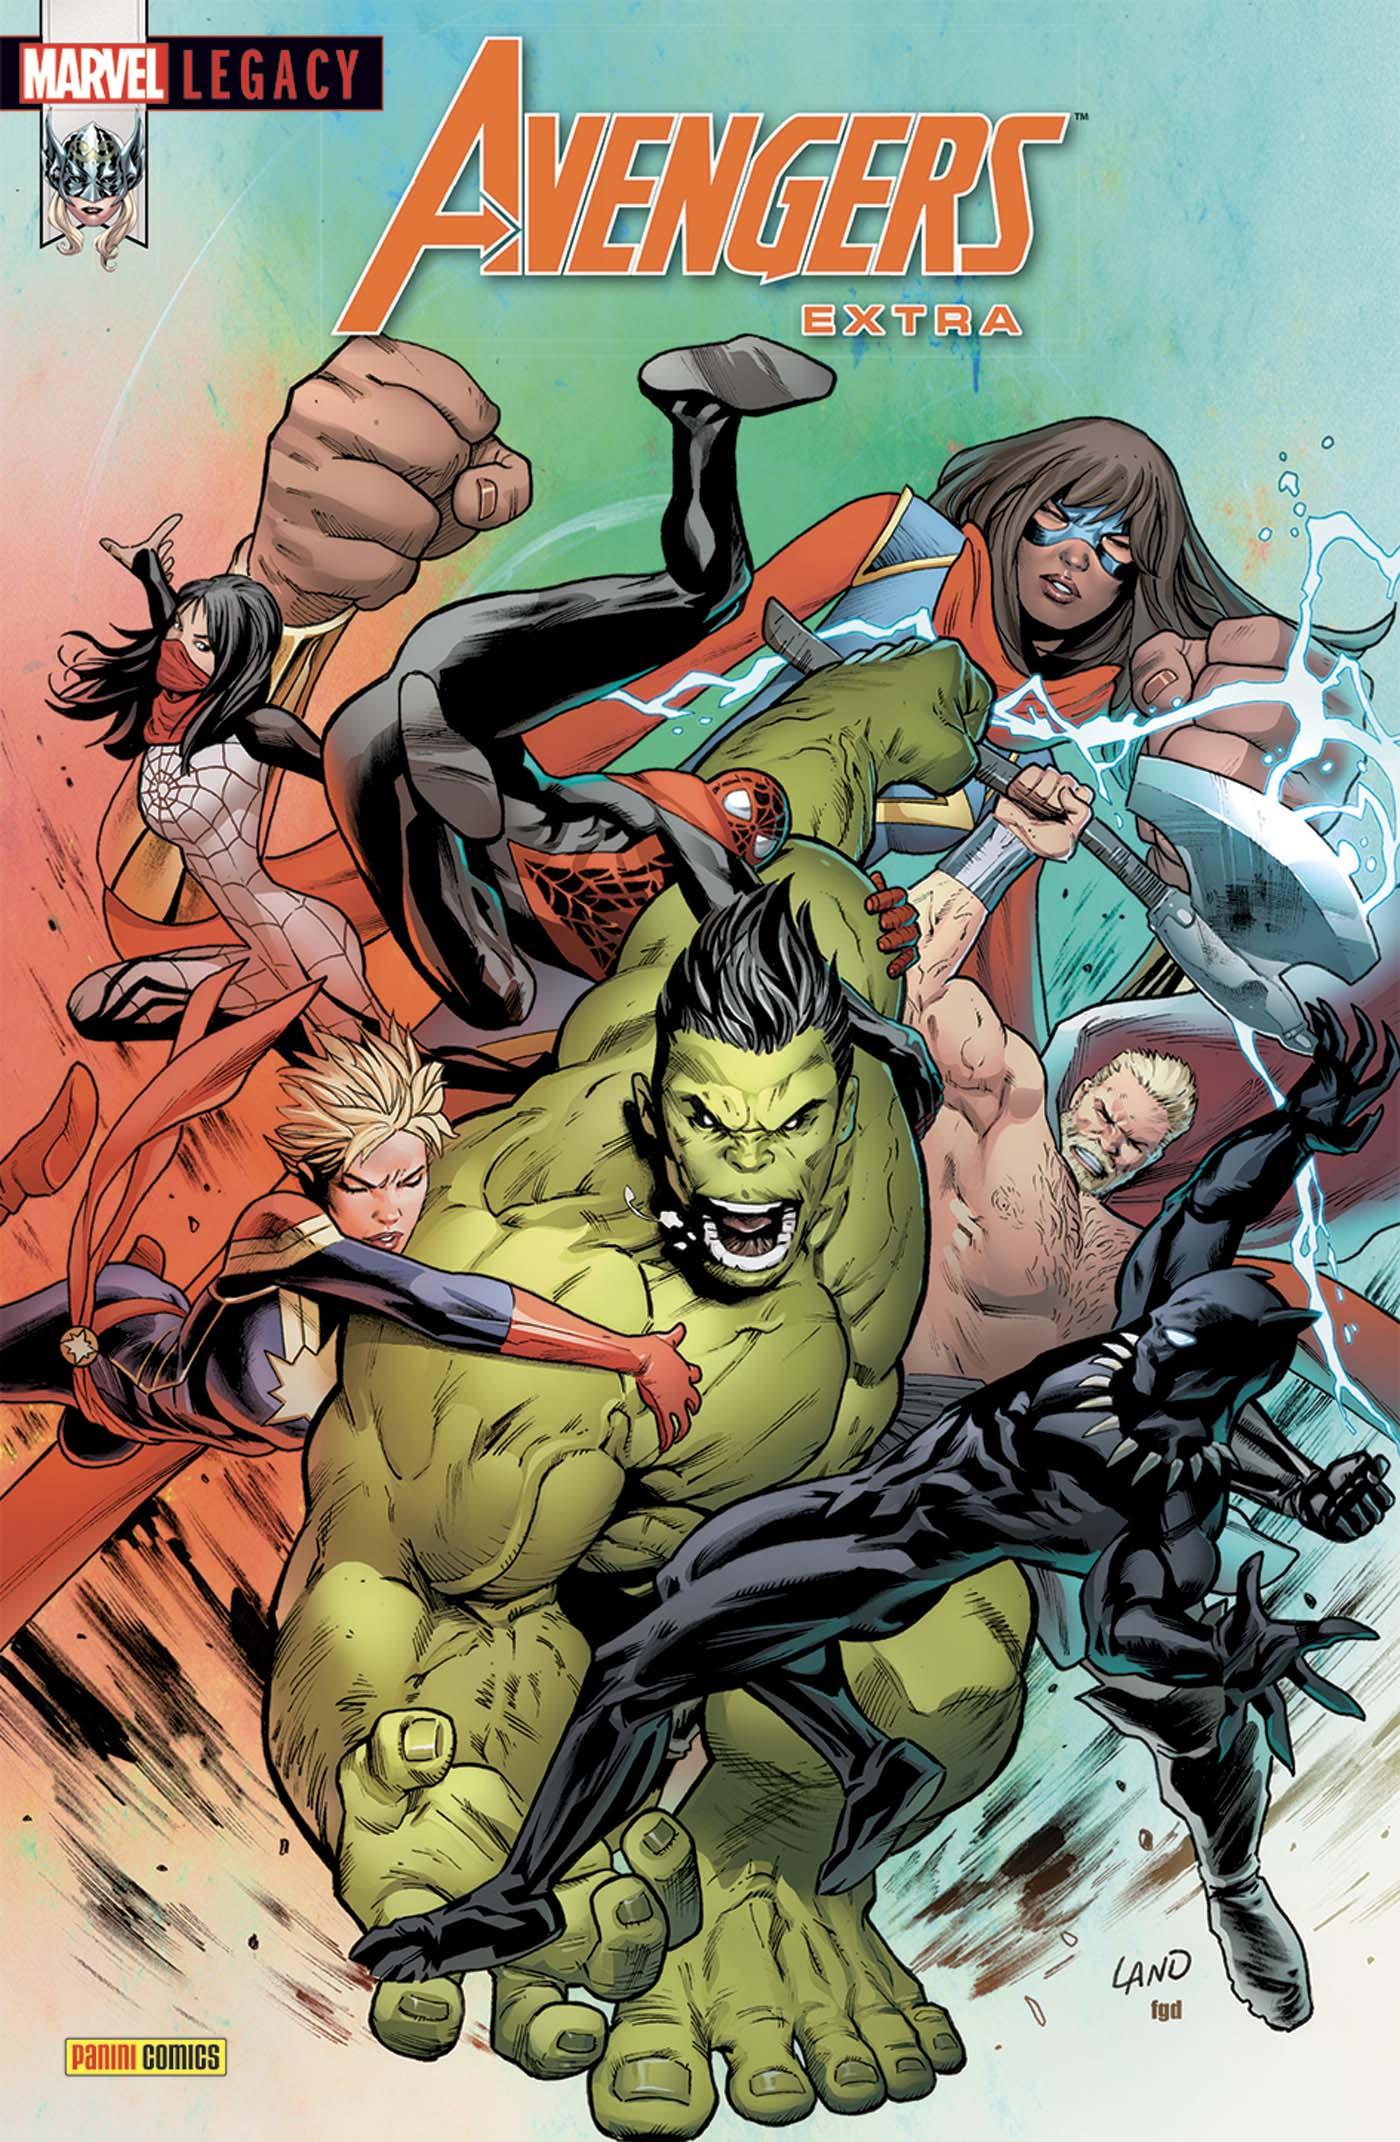 Marvel Legacy - Avengers Extra 5